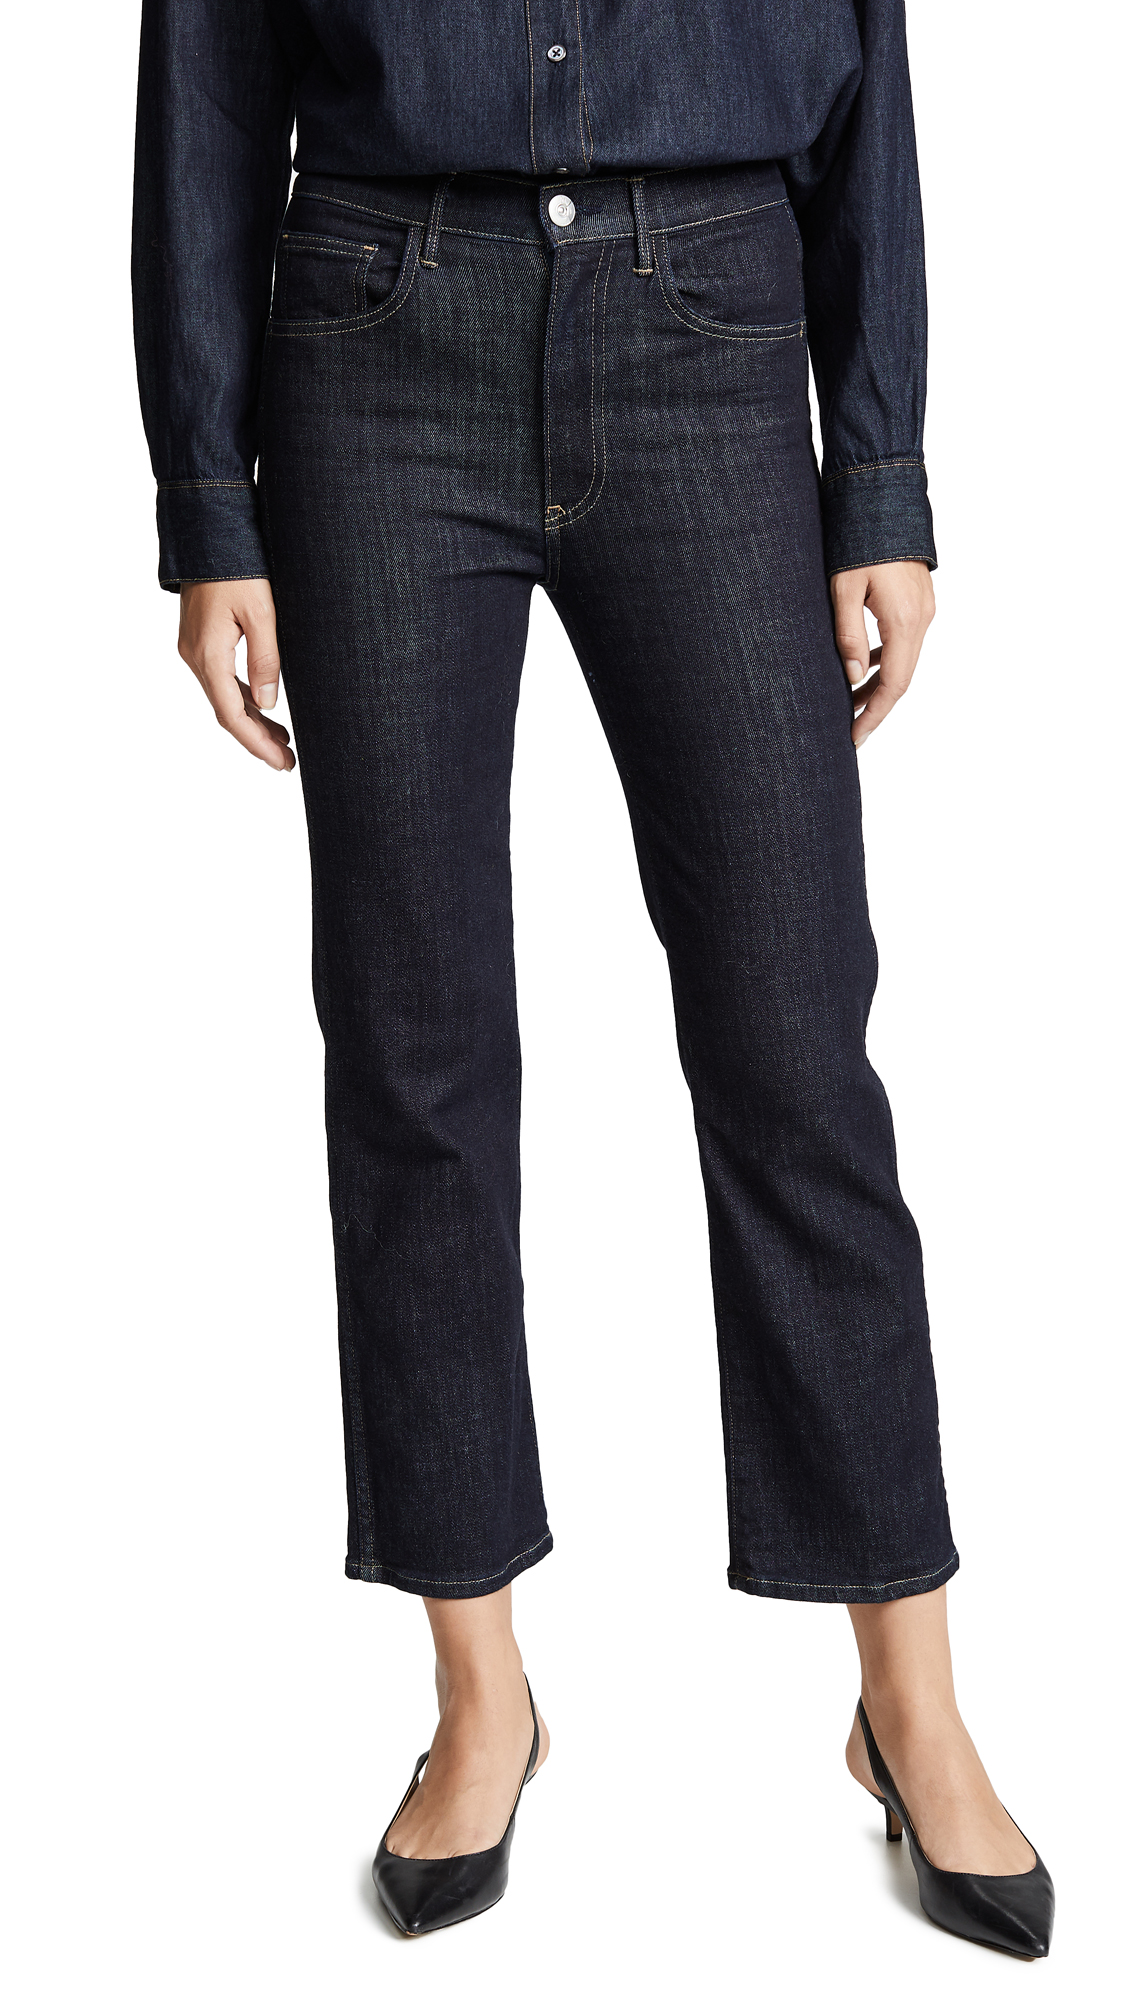 3x1 Joni Jeans In River